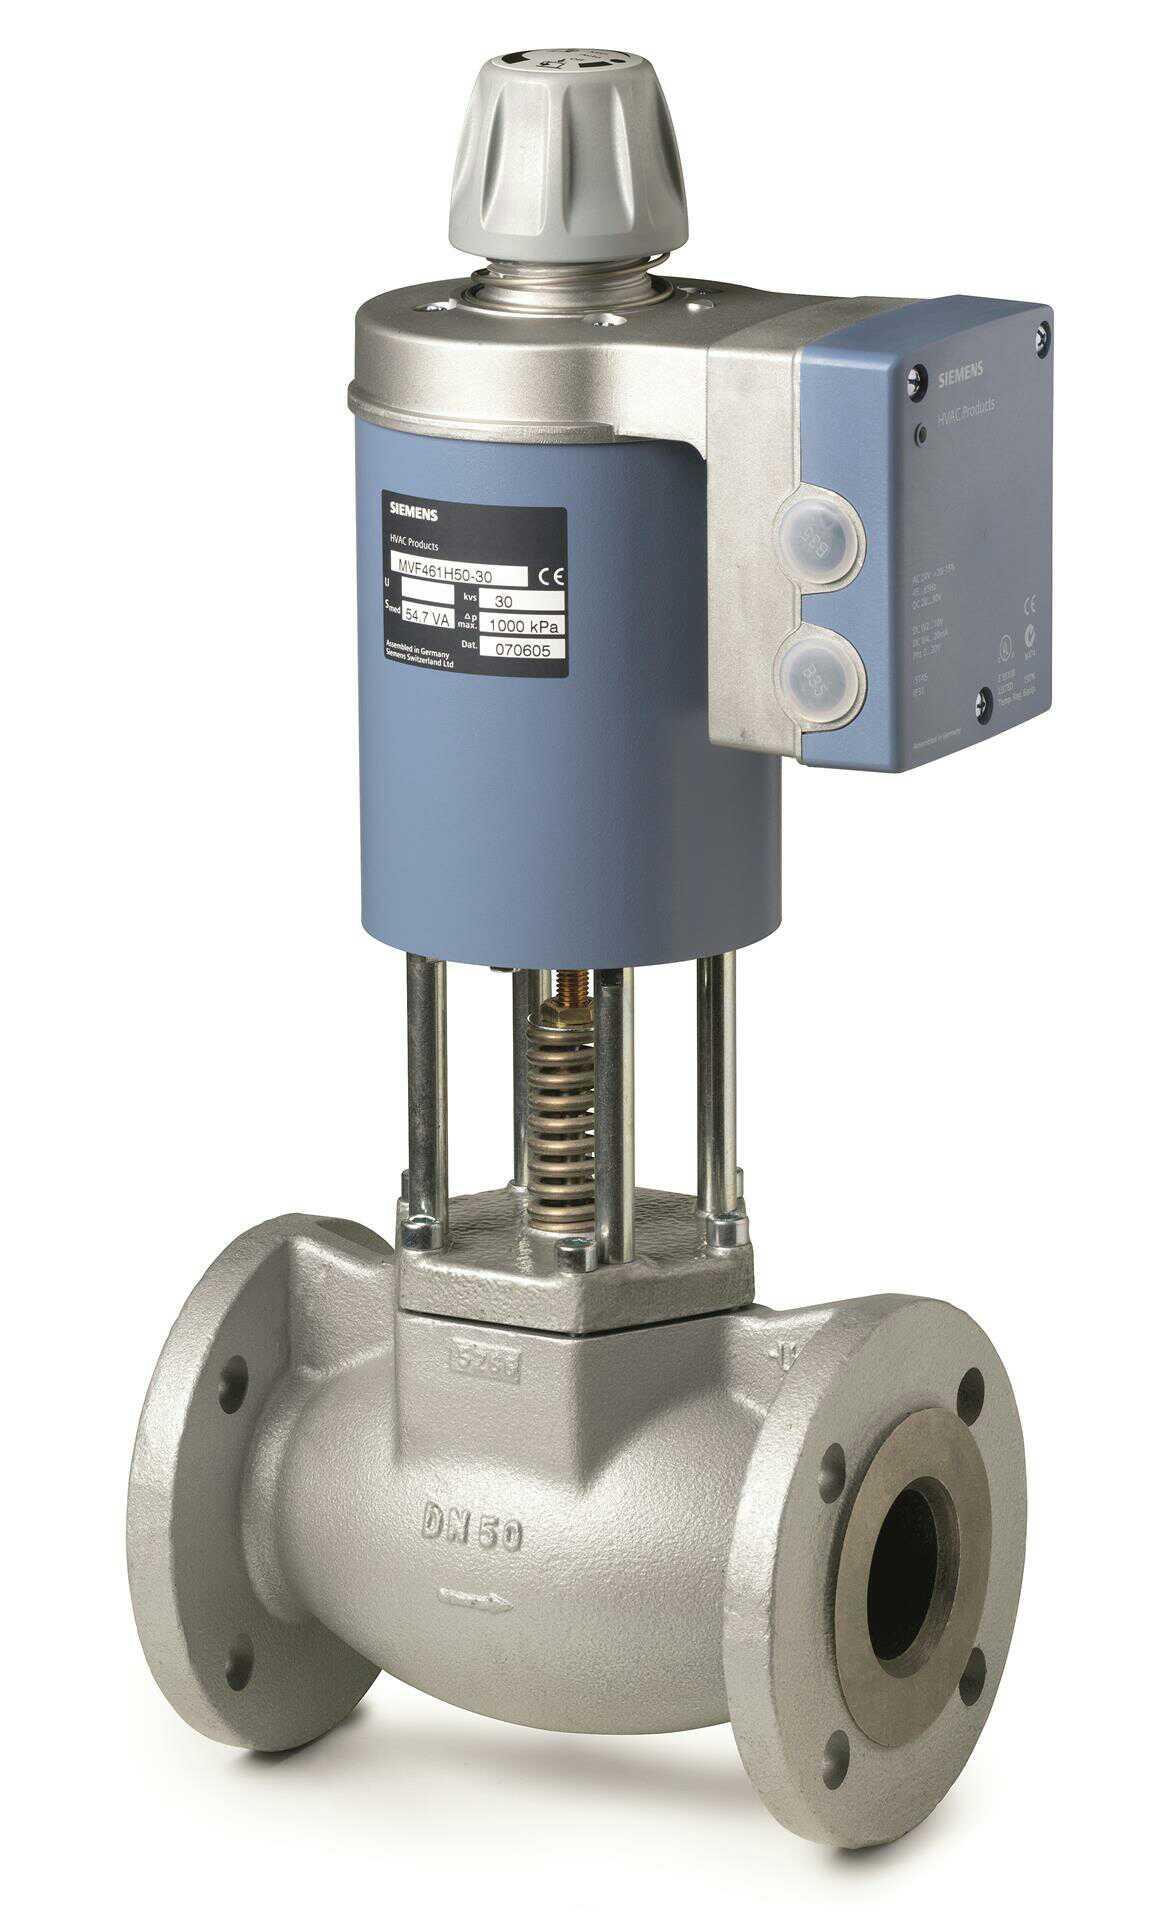 Siemens Siemens MVF461H25-8 vapor válvula electromagnética de segundo a través de la pestaña de 1 pulgada de pulgada